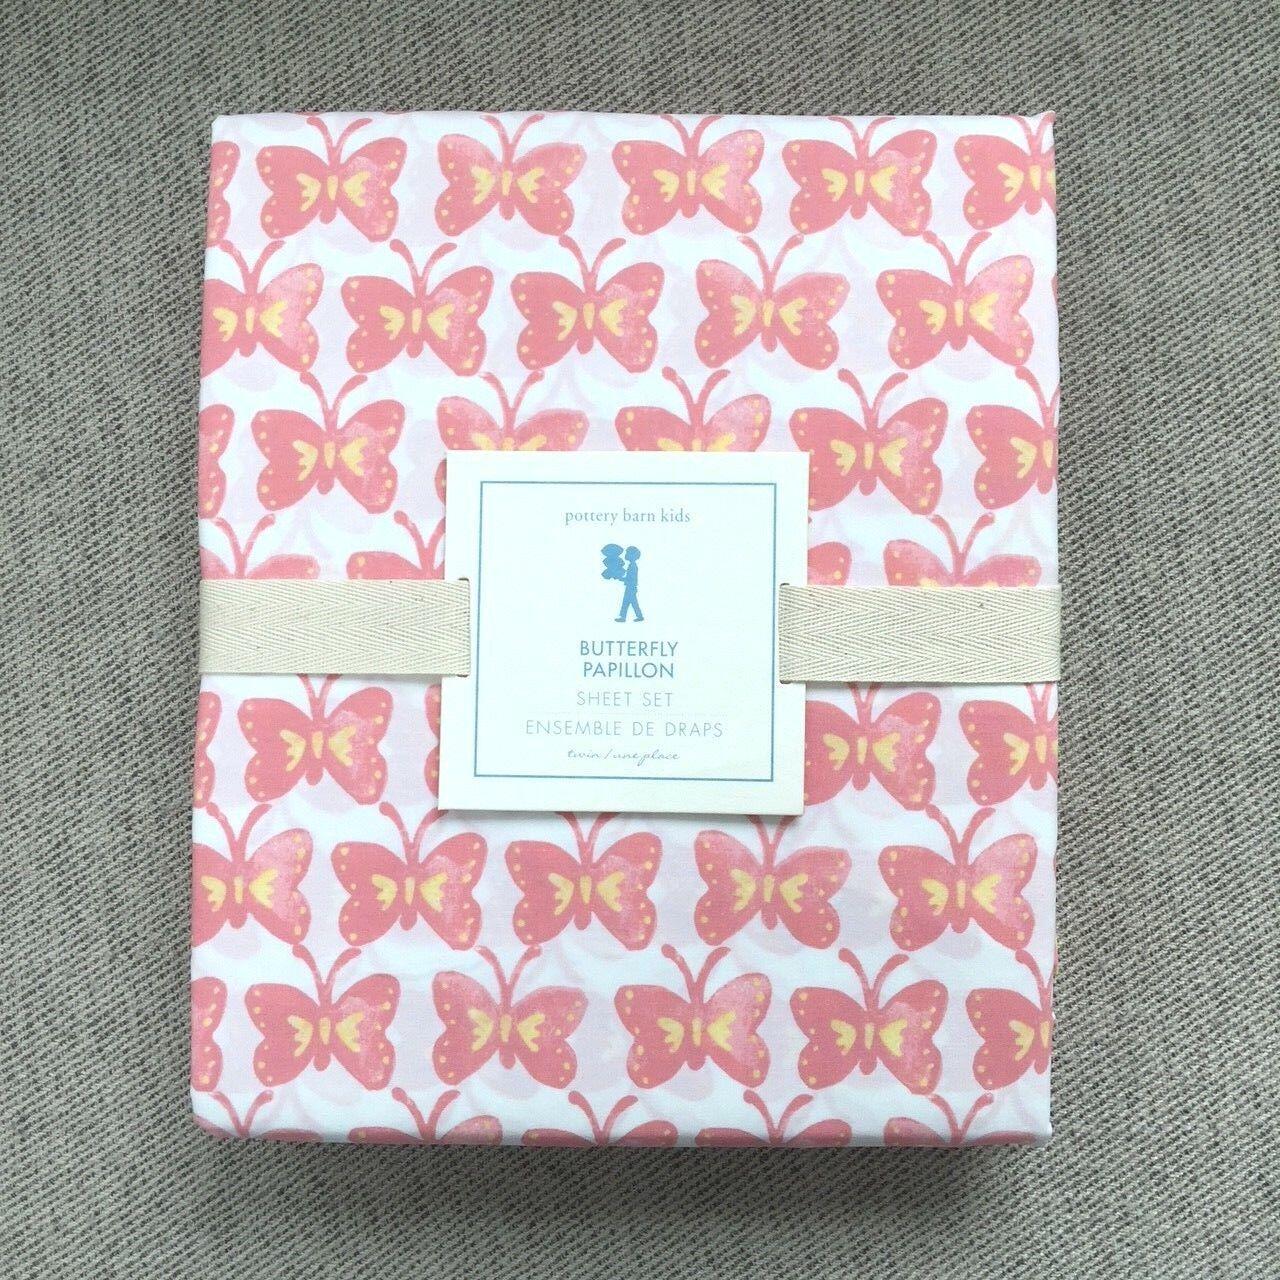 Pottery Barn Kids Butterfly Papillon Twin sheet set white, Coral, Pink,  yellow